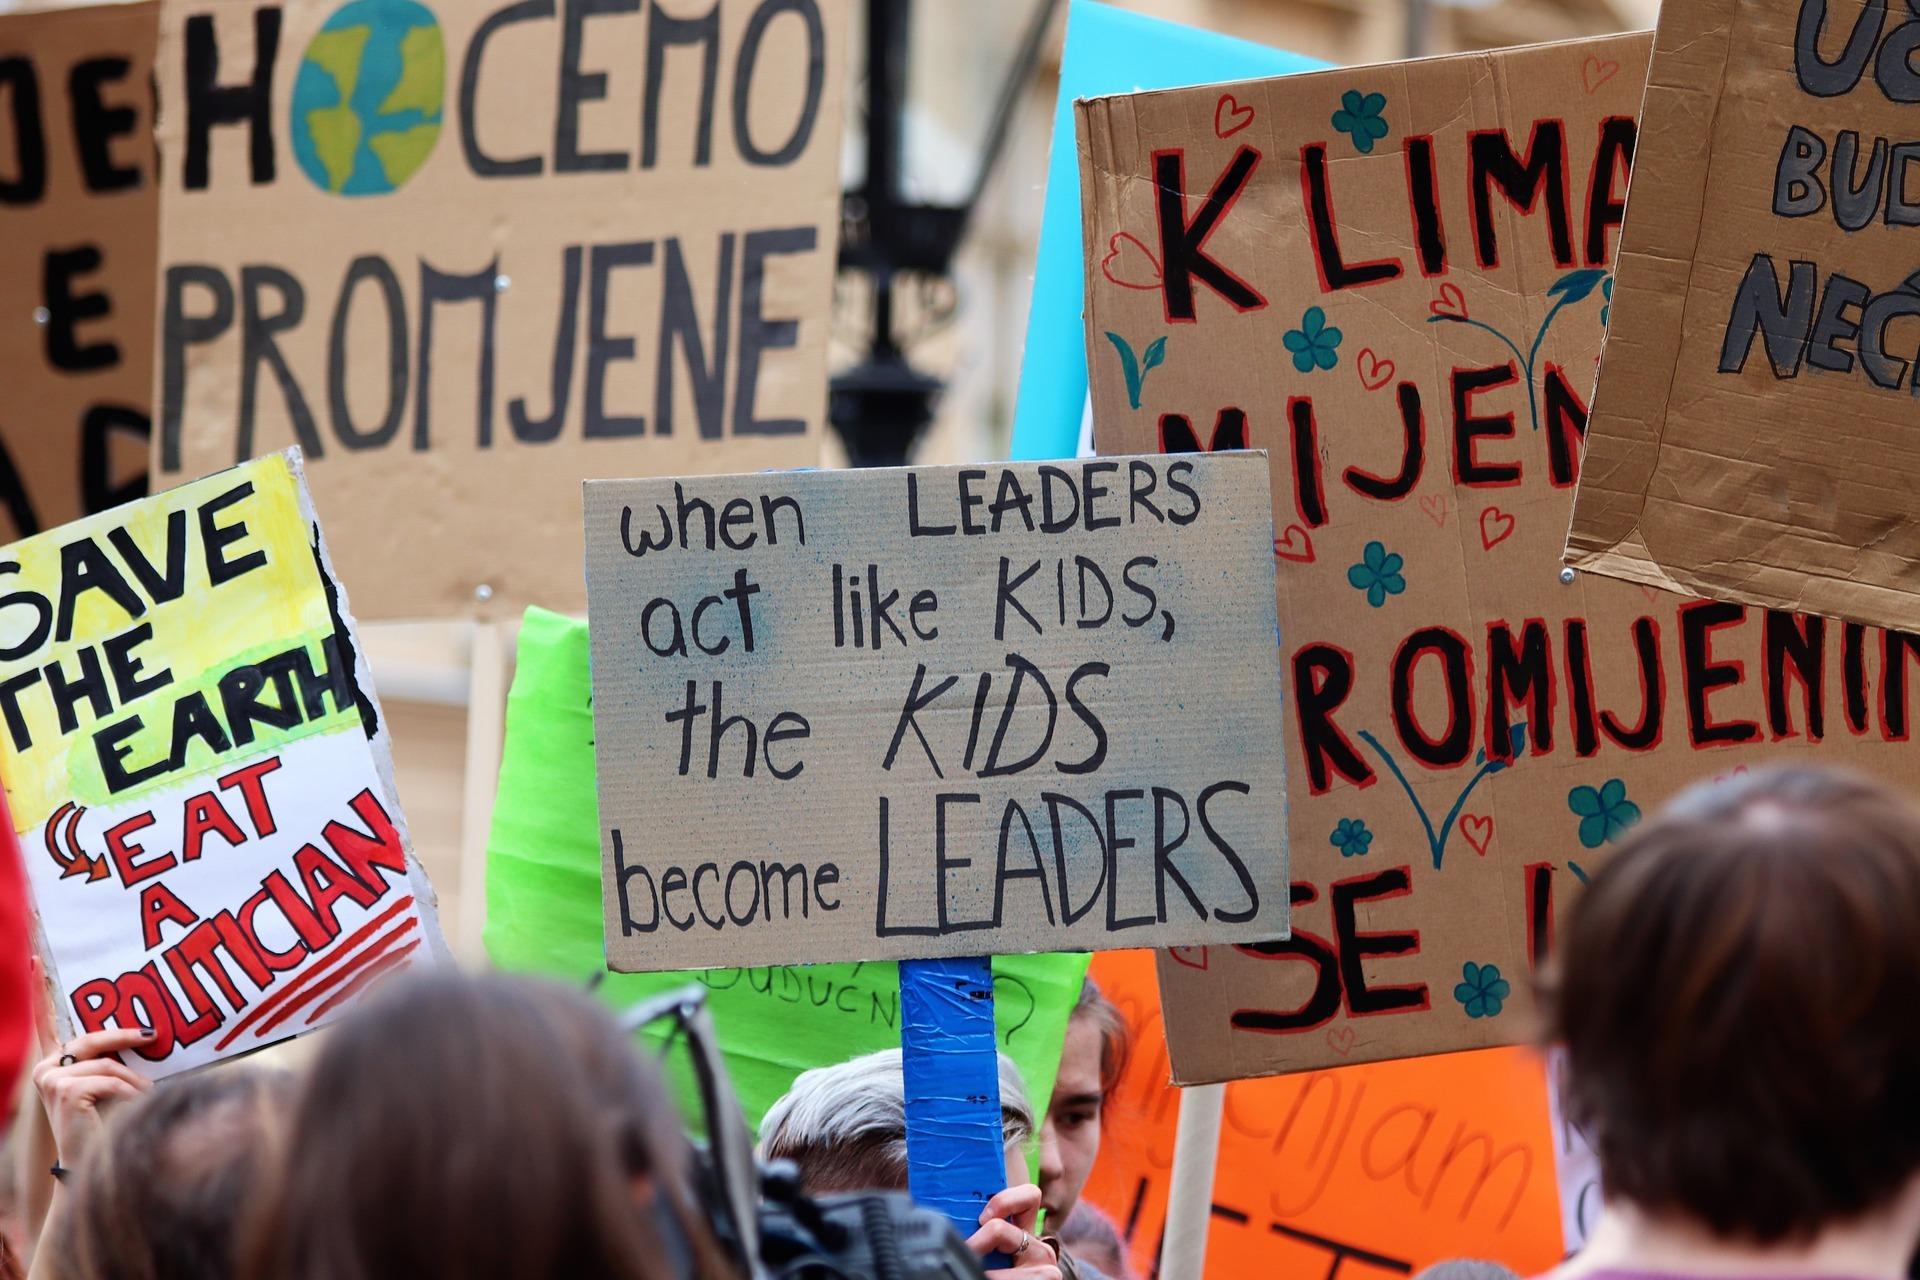 Fridays for Future vuelve a las calles para protestar en contra del cambio climático